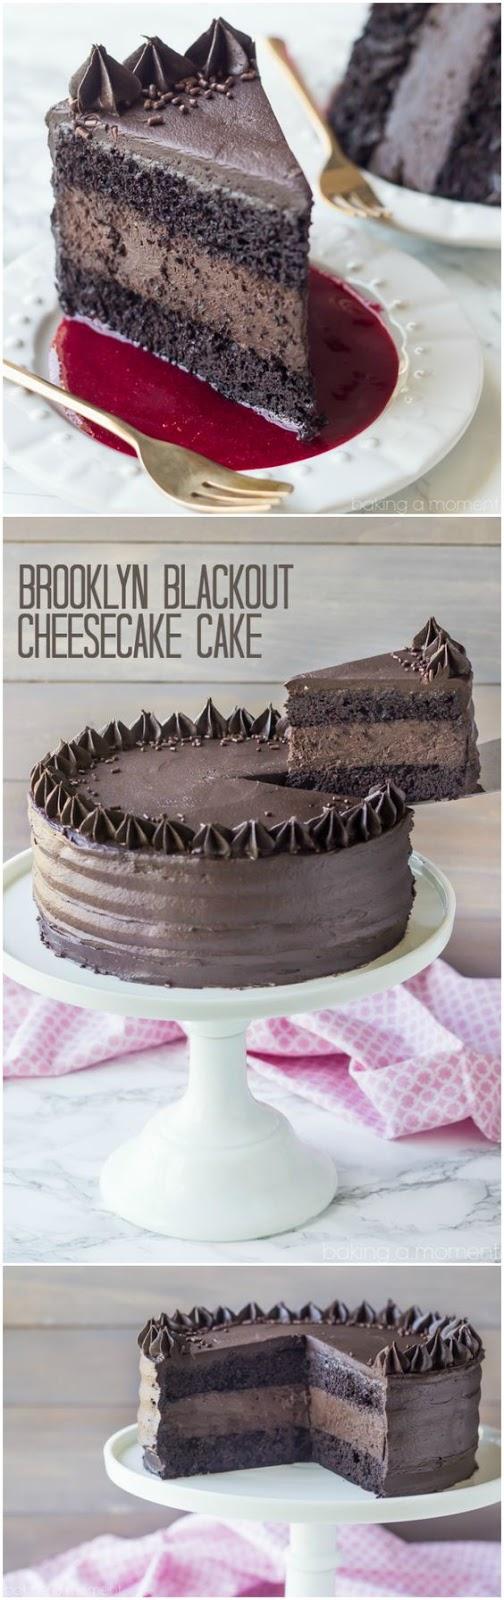 Brooklyn Blackout Cheesecake Cake #Brooklyn #Blackoputcake #Cheesecake #Browncake #deleciouscake #Bestcake #Favoritecake #USA #Italaincake #Indiancake #Denmarkcake